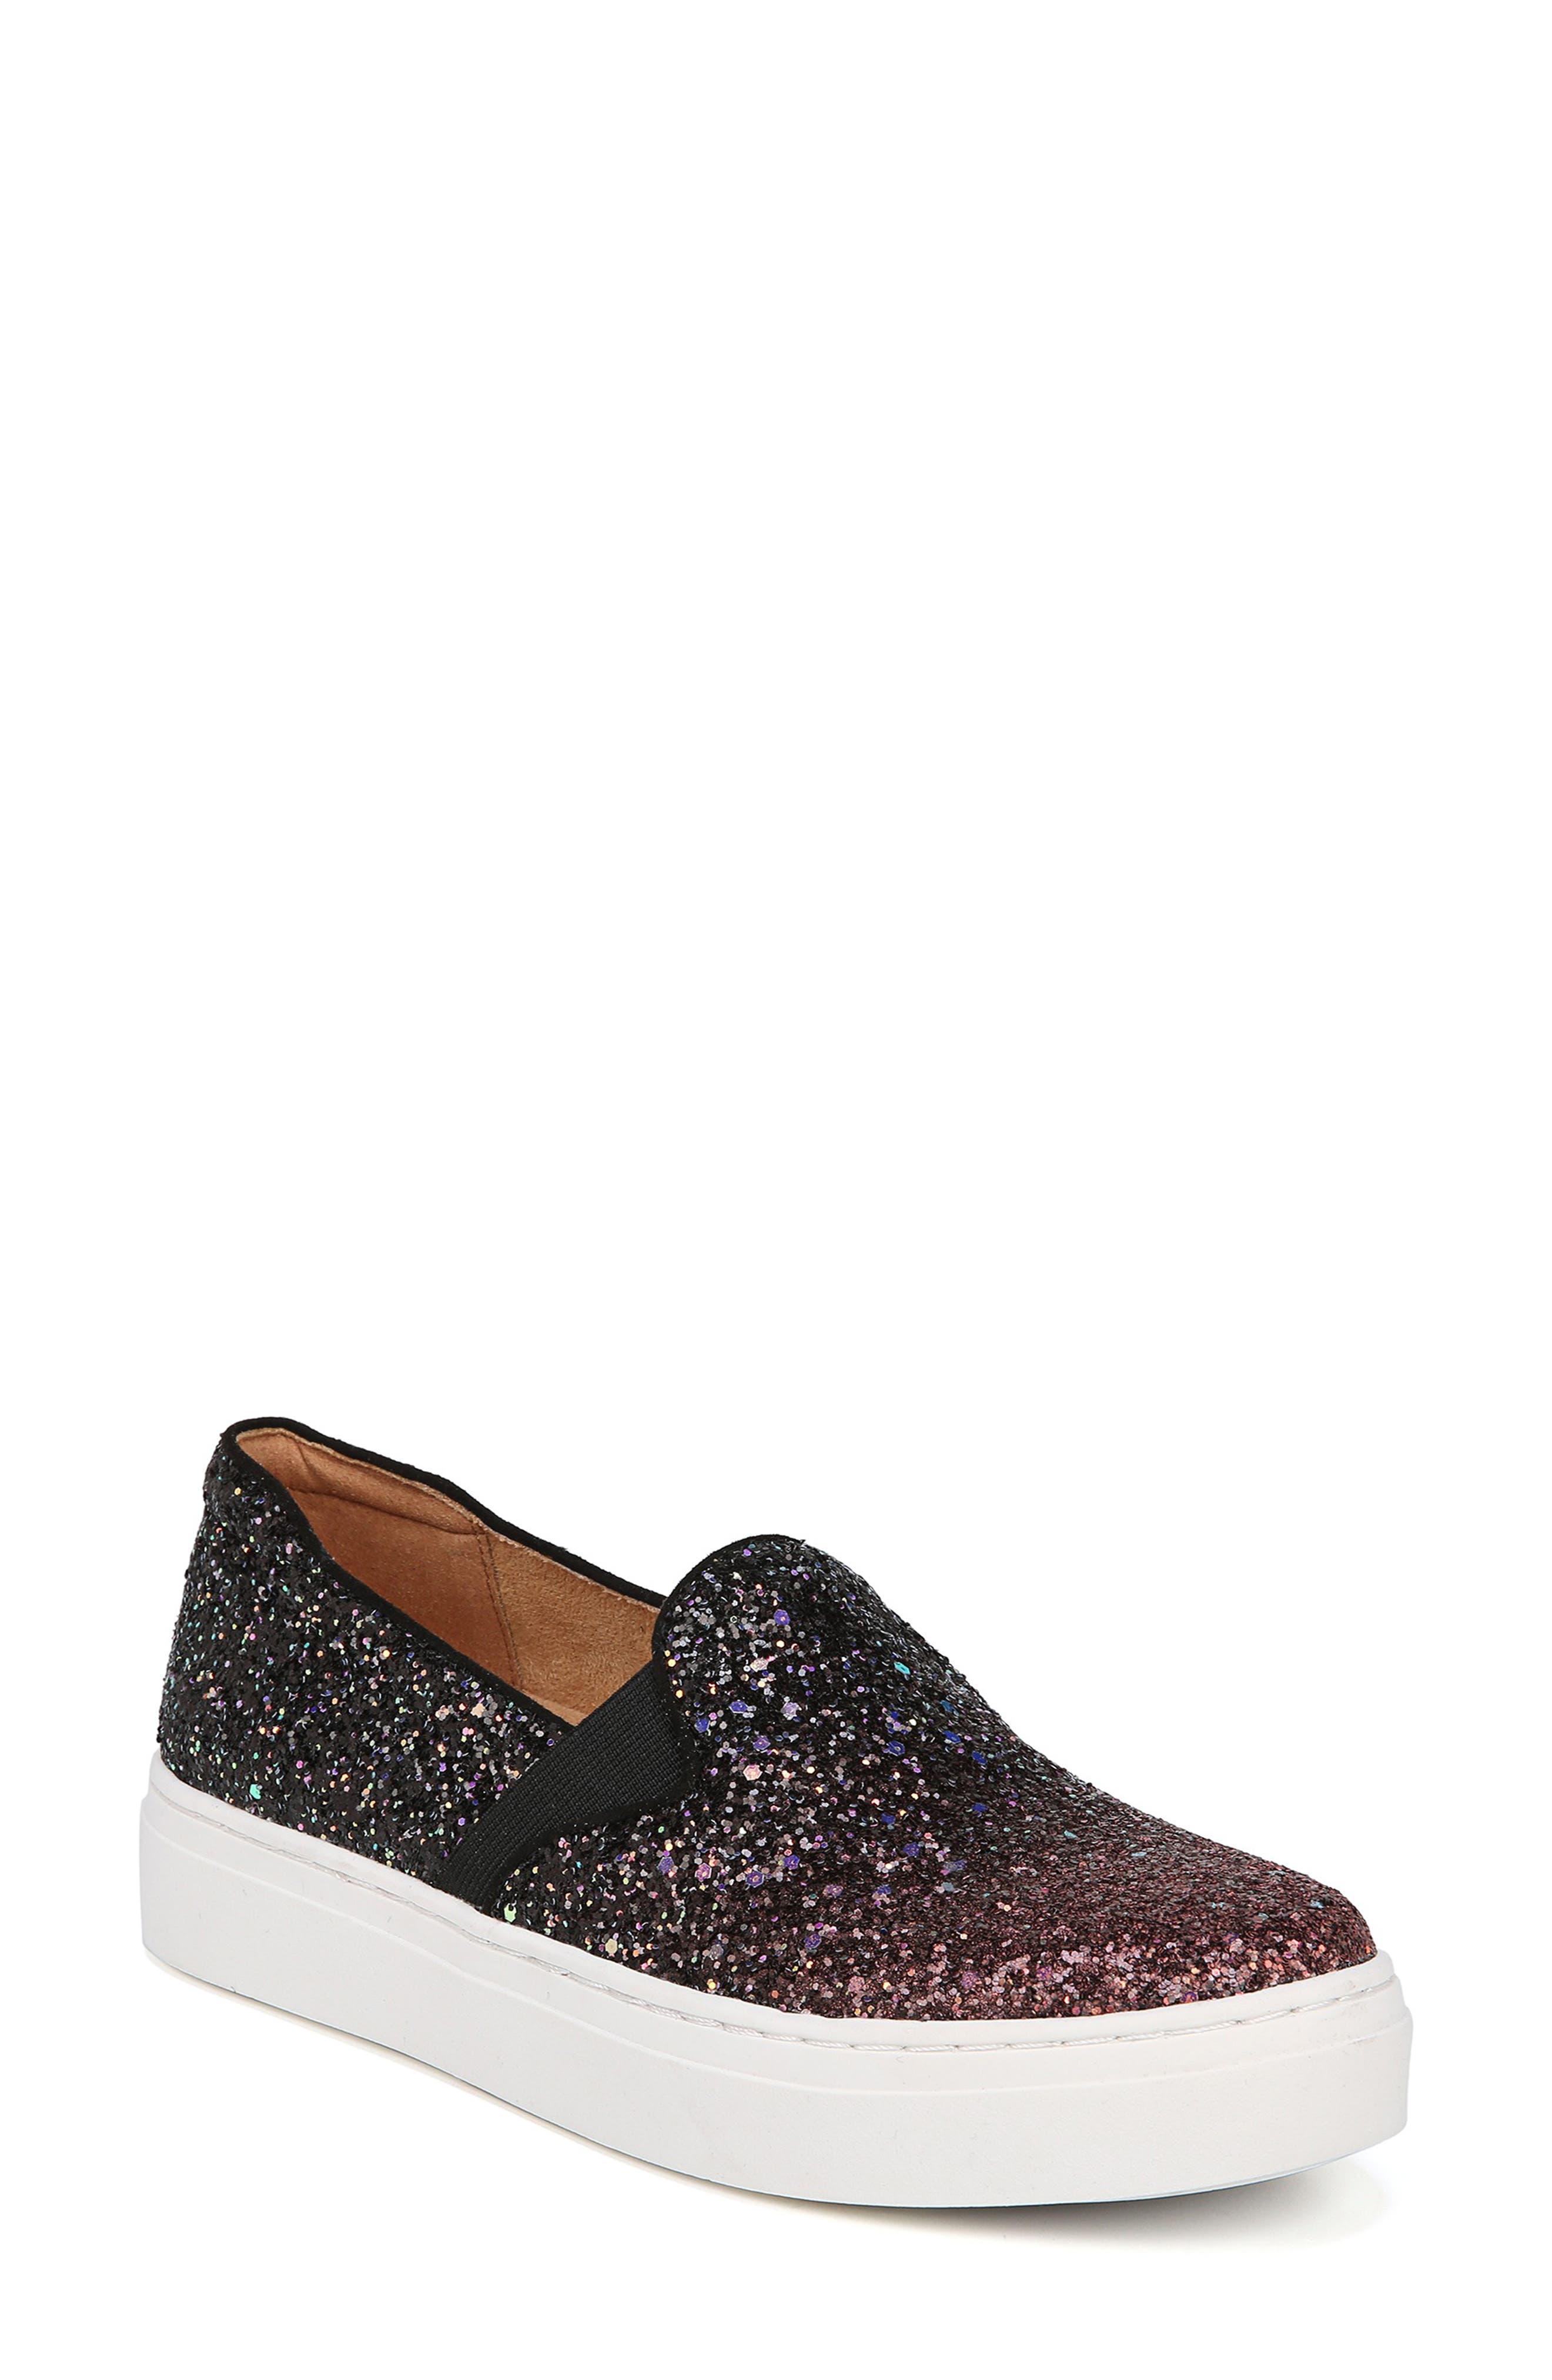 NATURALIZER Carly Slip-On Sneaker, Main, color, MULTI GLITTER FABRIC